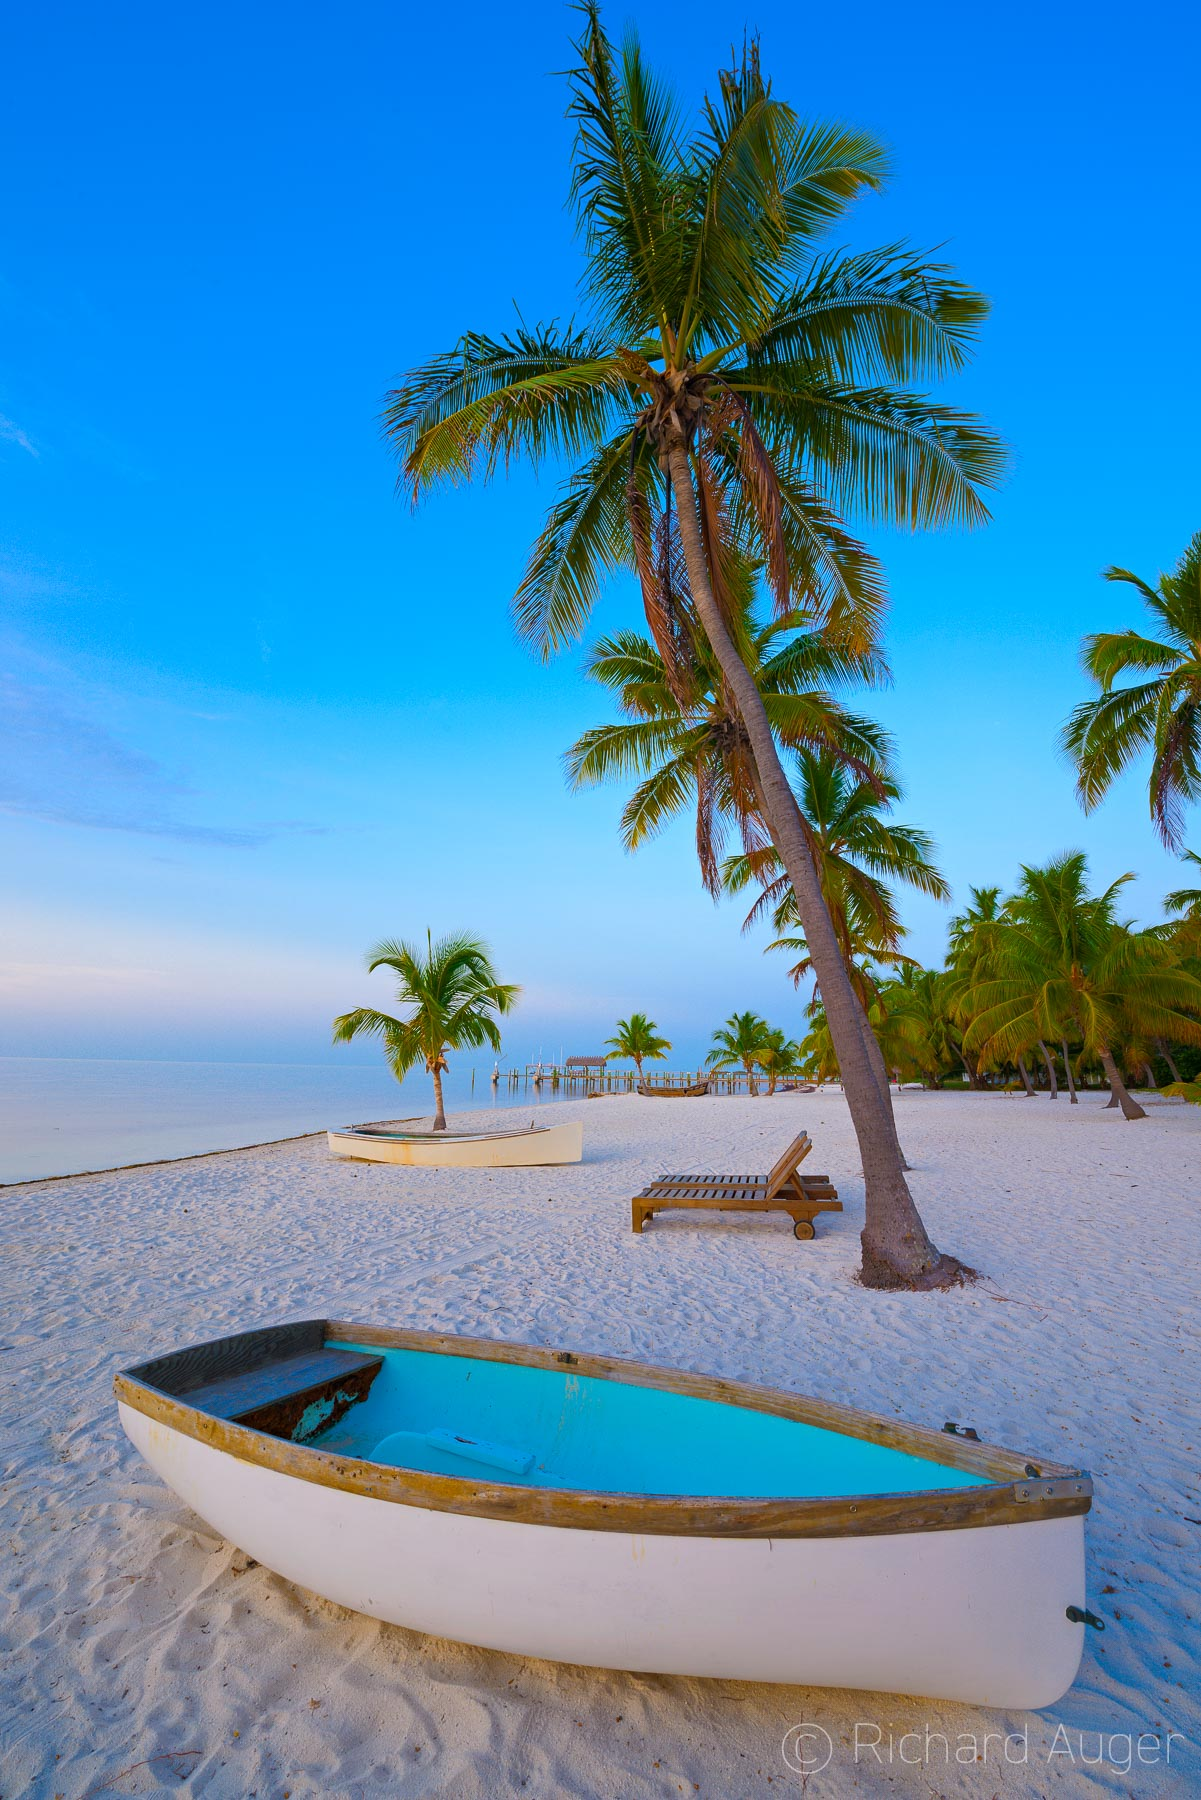 Islamorada, Florida Keys, Key West, Beach, Calm, Morning, Boat, Photograph, Richard Auger